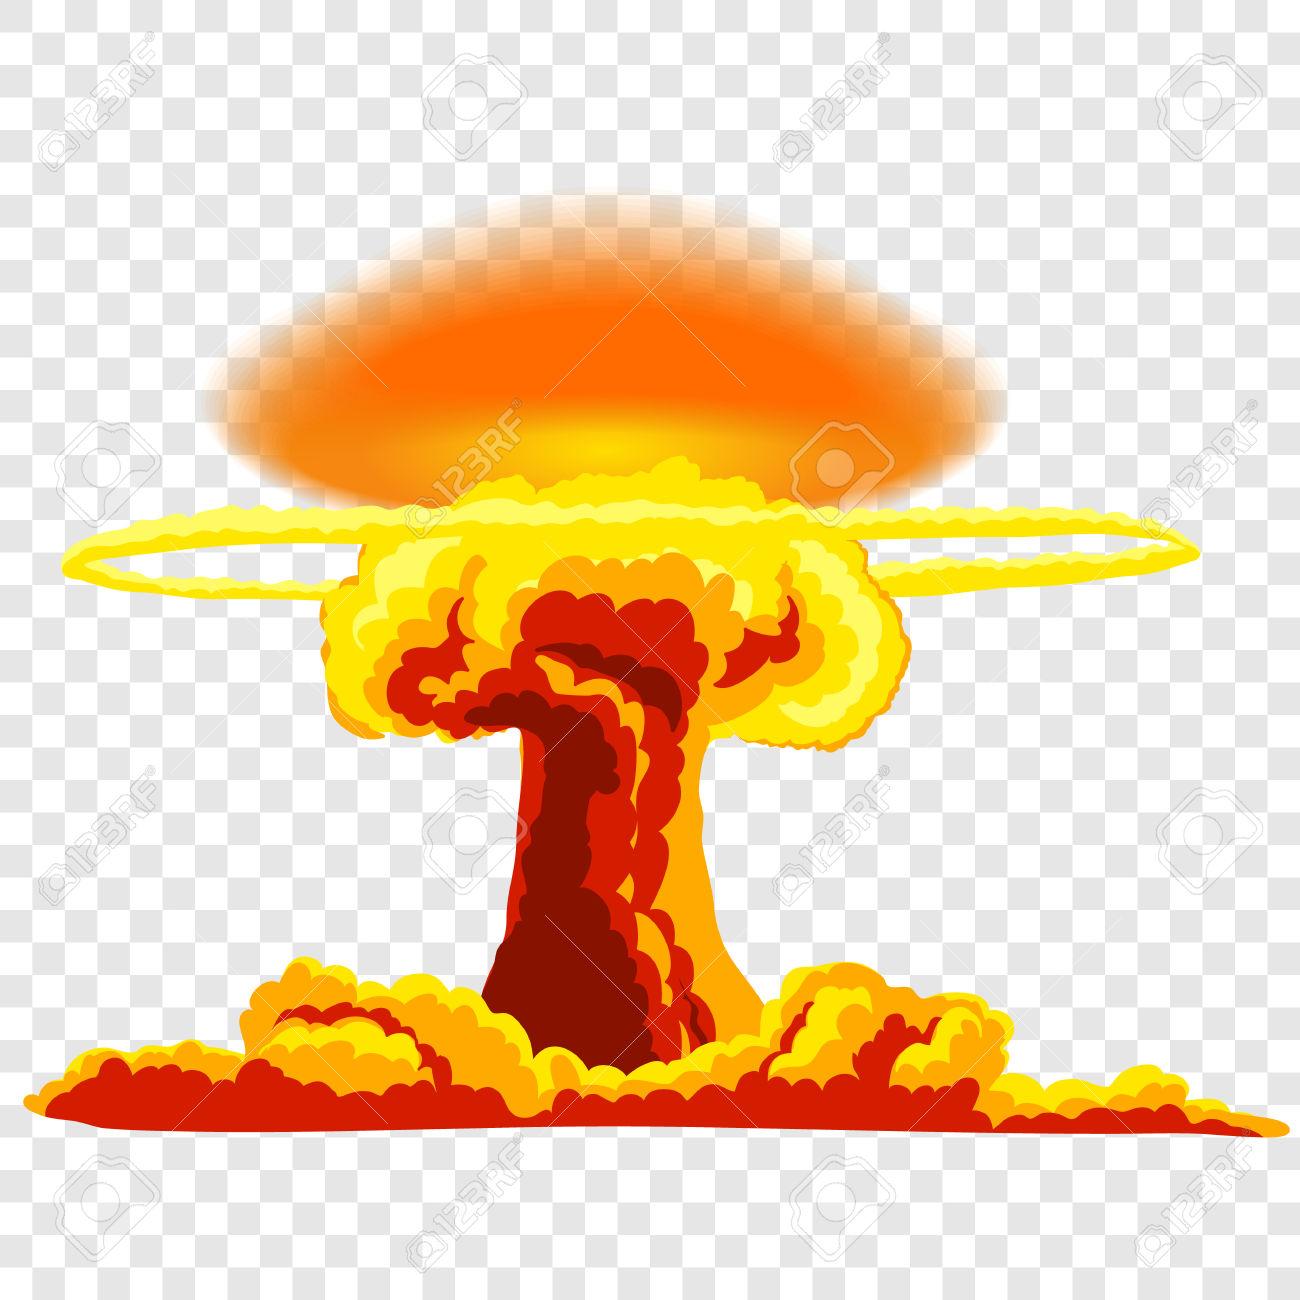 atom bomb clipart no background #10